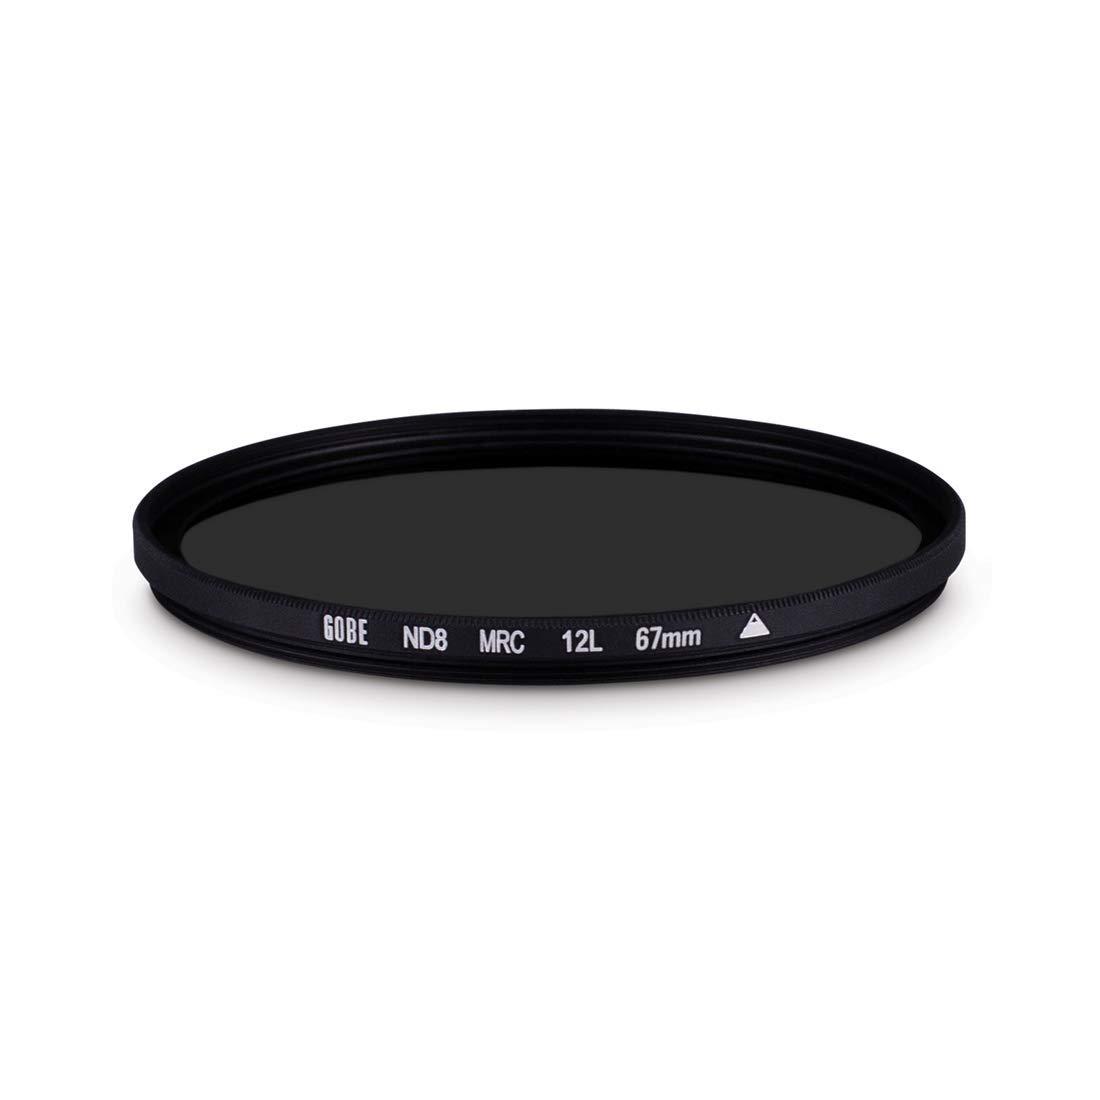 Gobe ND8 58mm MRC 12-layer ND Filter